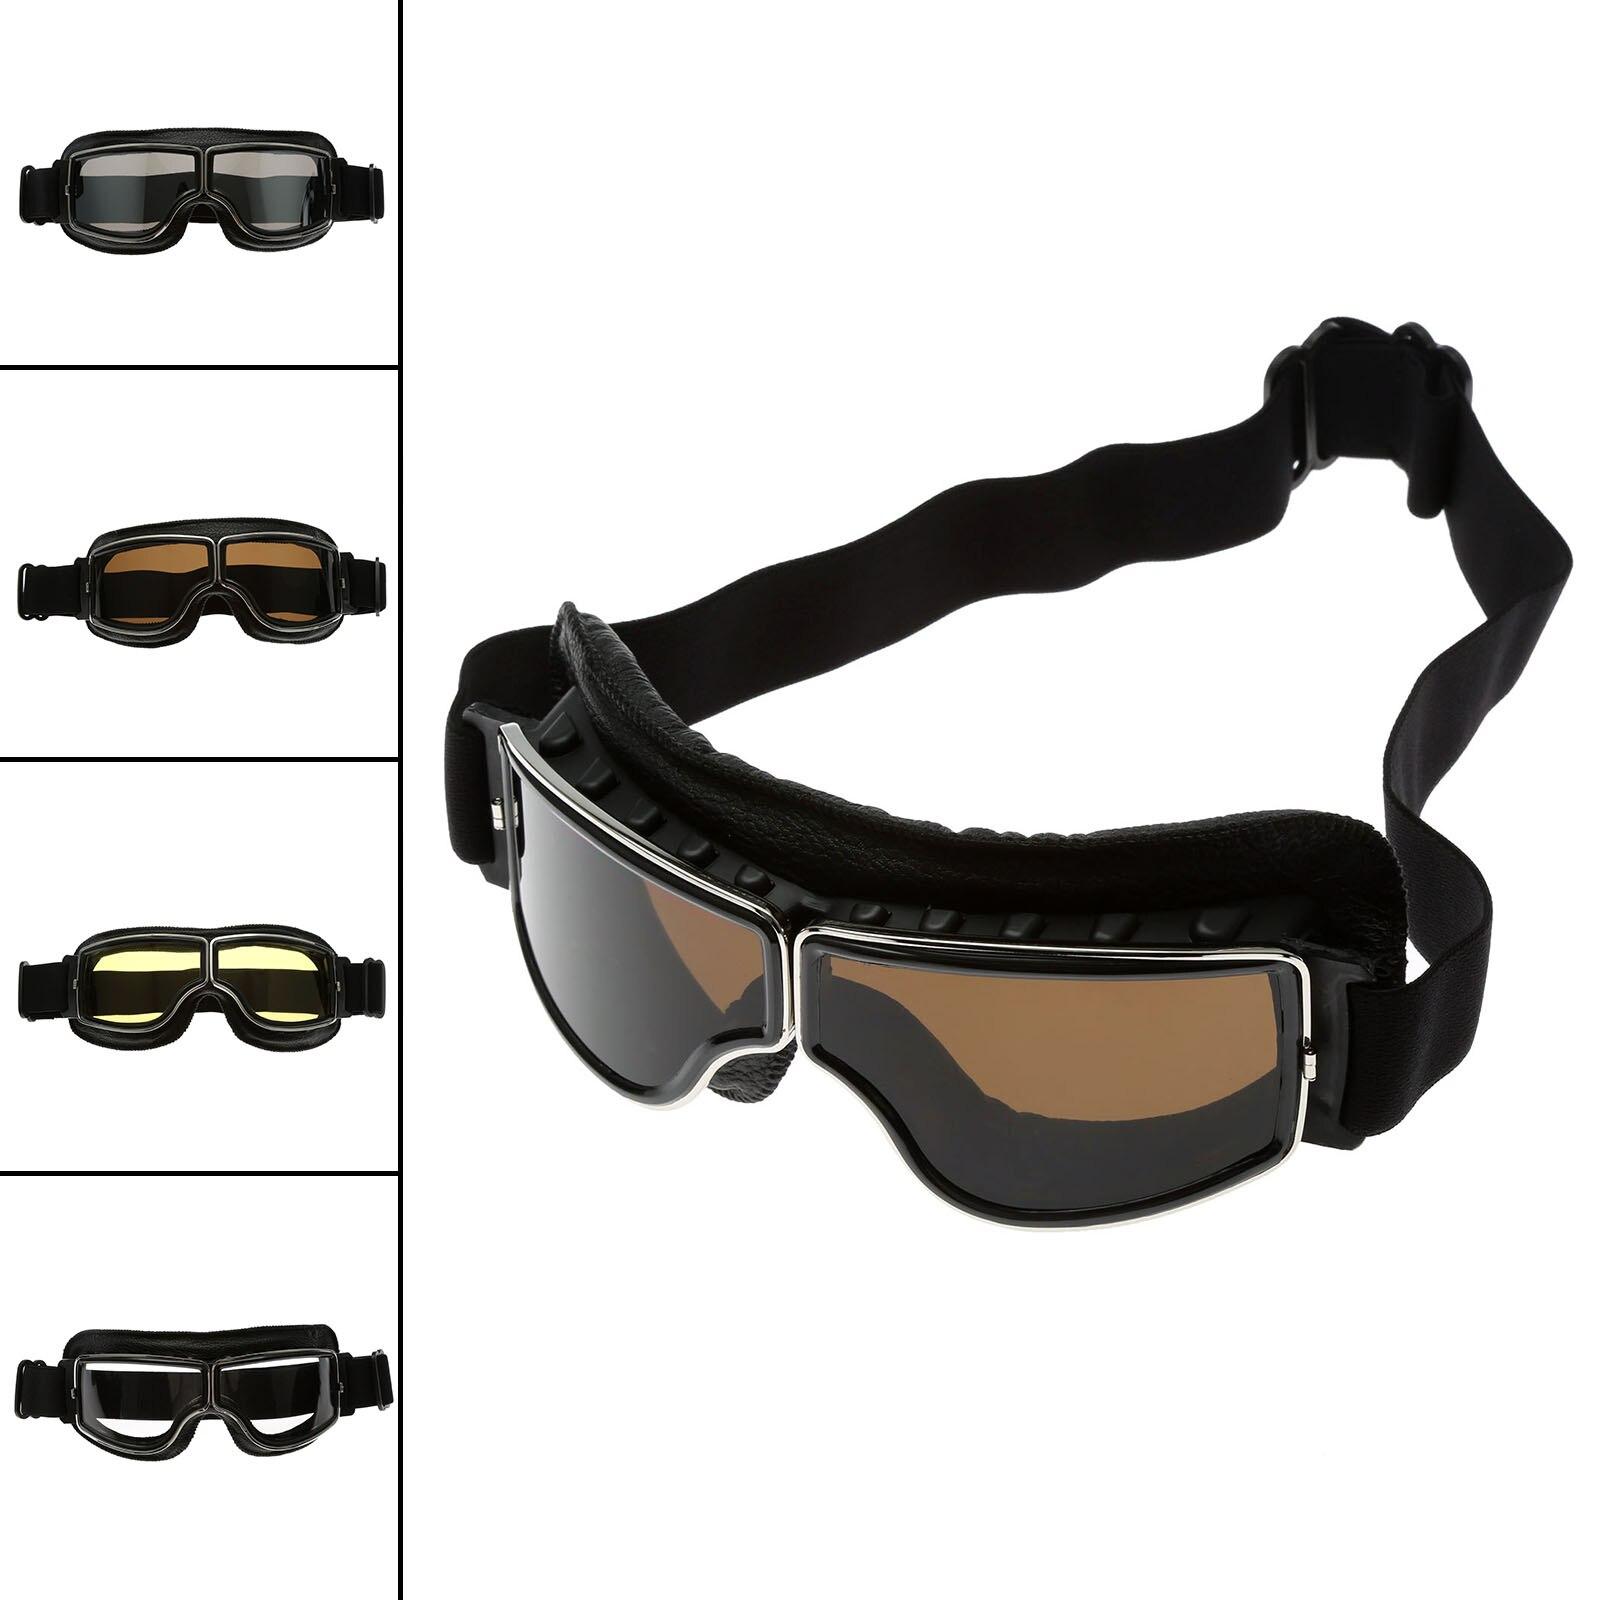 Retro Motorcycle Goggles Motocross Helmet Glasses UV Protection Ski Snowboard Skate Goggle Retro Eyewear Lens Leather